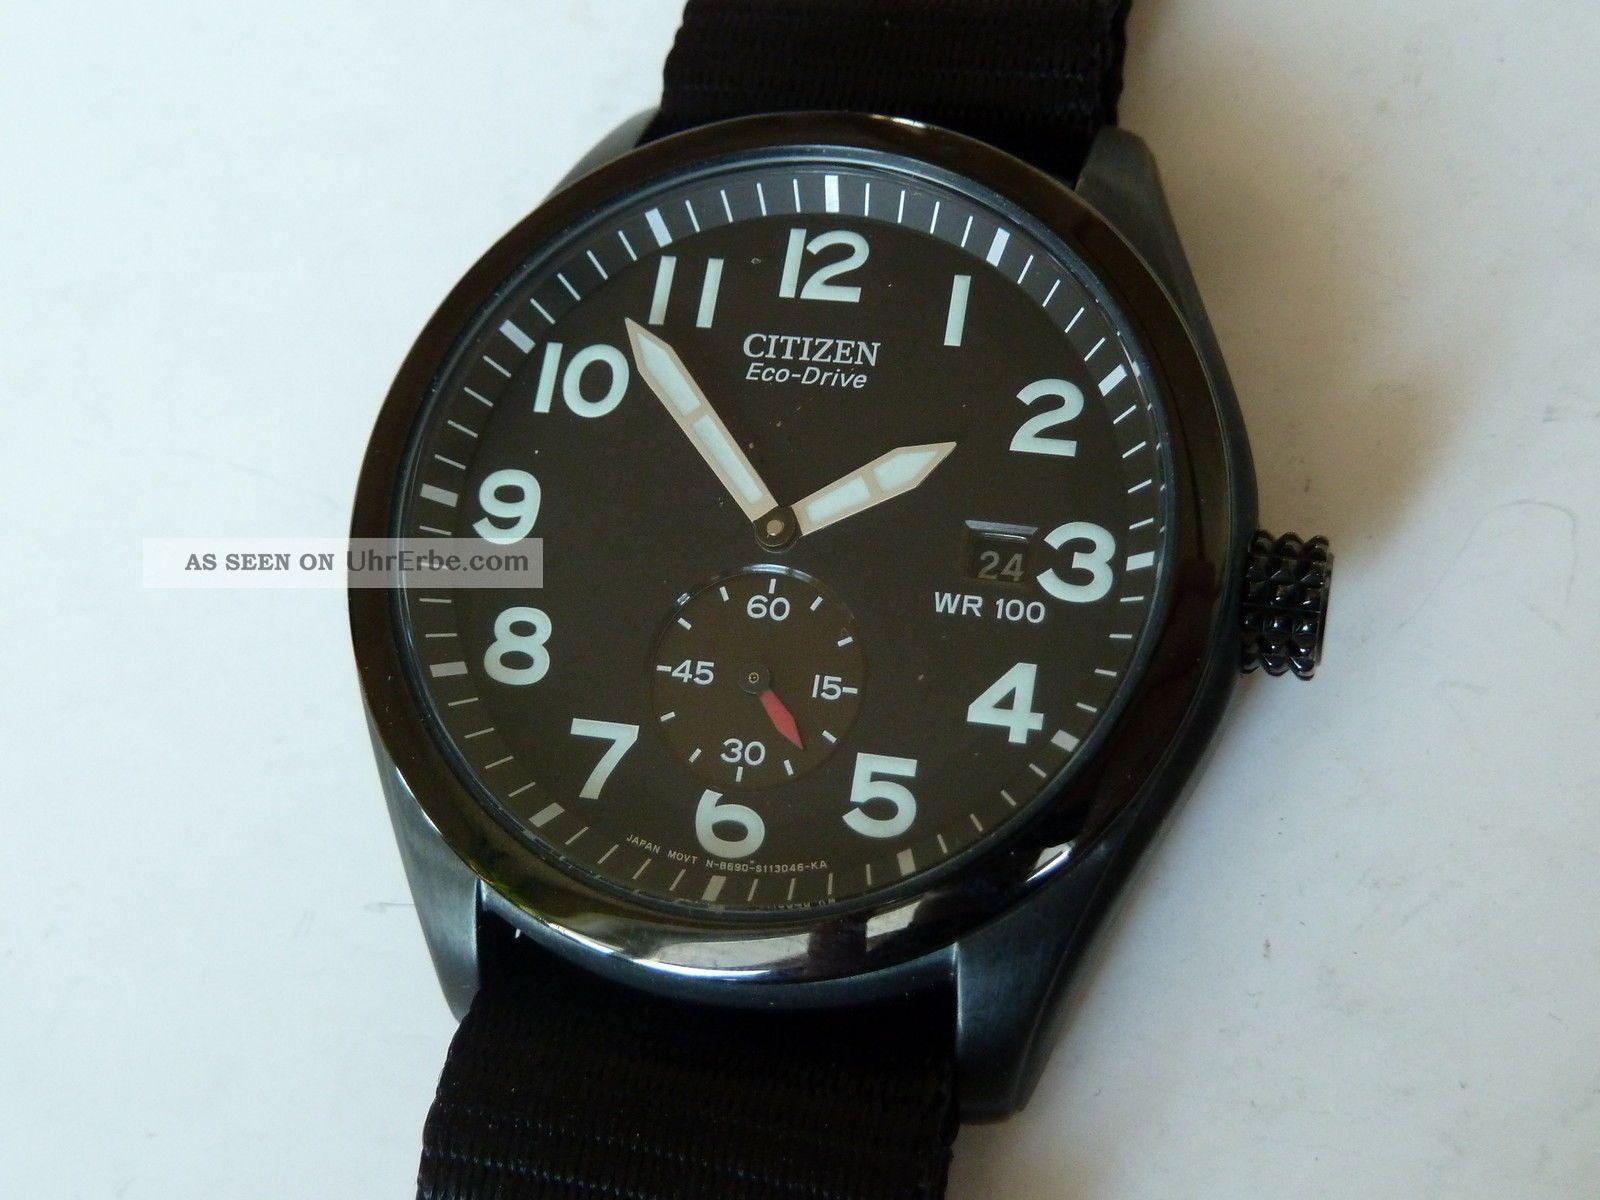 Black Edition Edelstahl Citizen Eco Drive / Solar Analoguhr Armbanduhren Bild